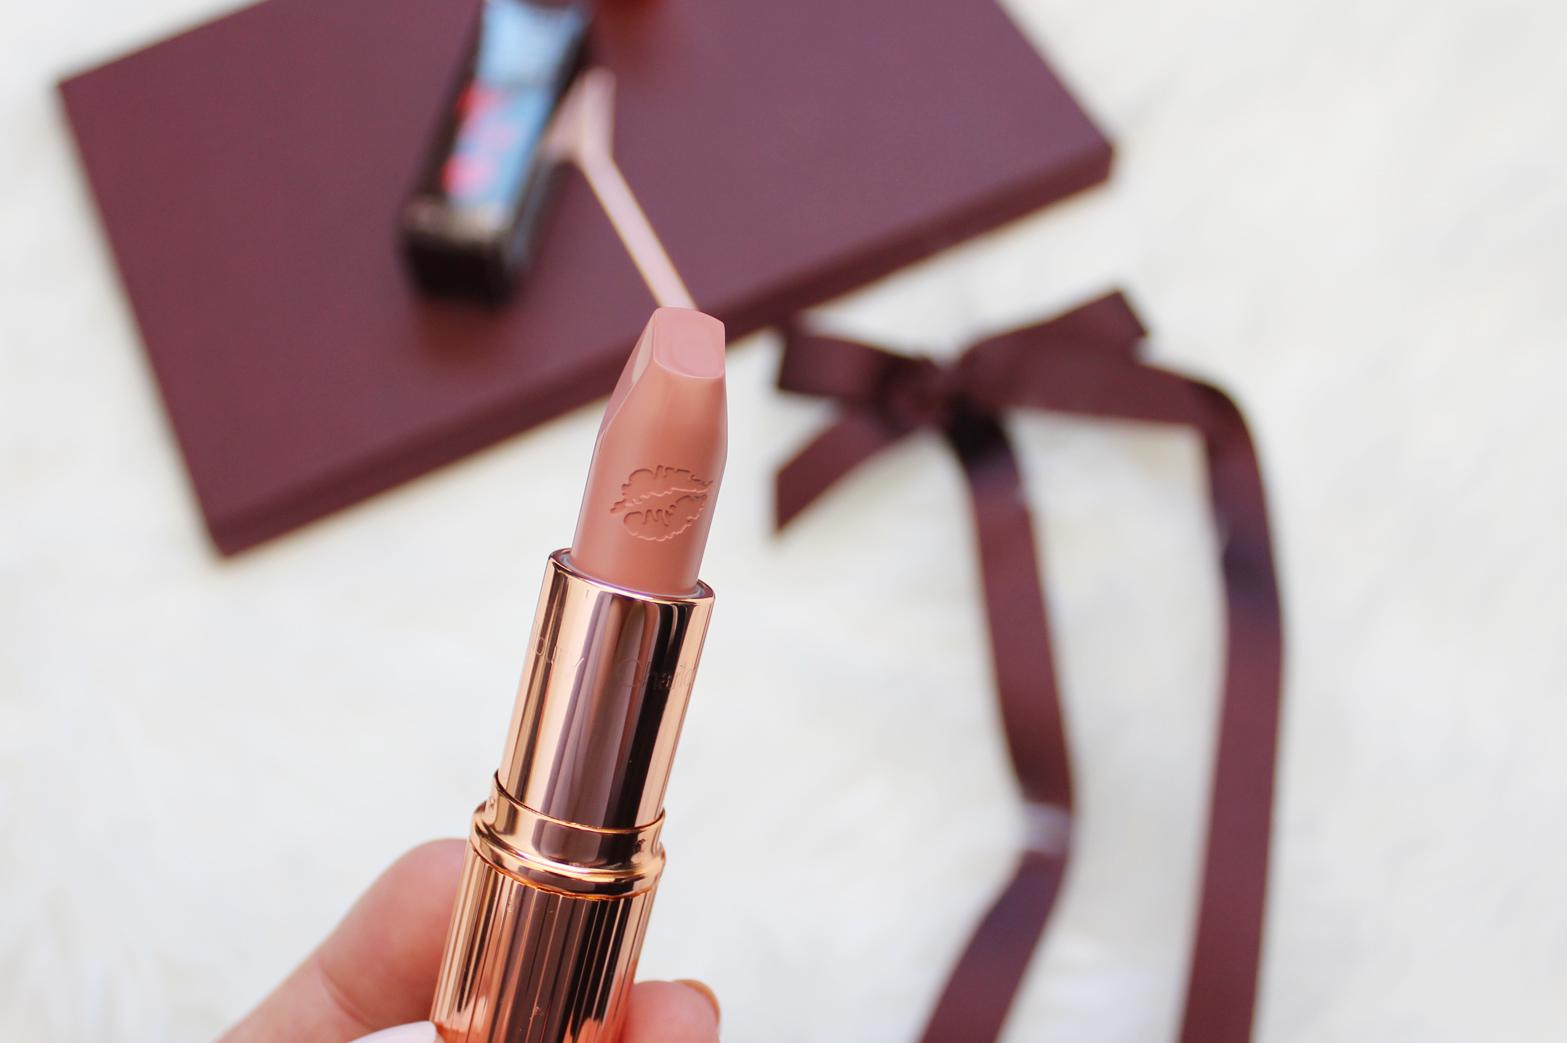 CHARLOTTE TILBURY | Hot Lips K.I.S.S.I.N.G Lipstick in Kim K.W. - CassandraMyee